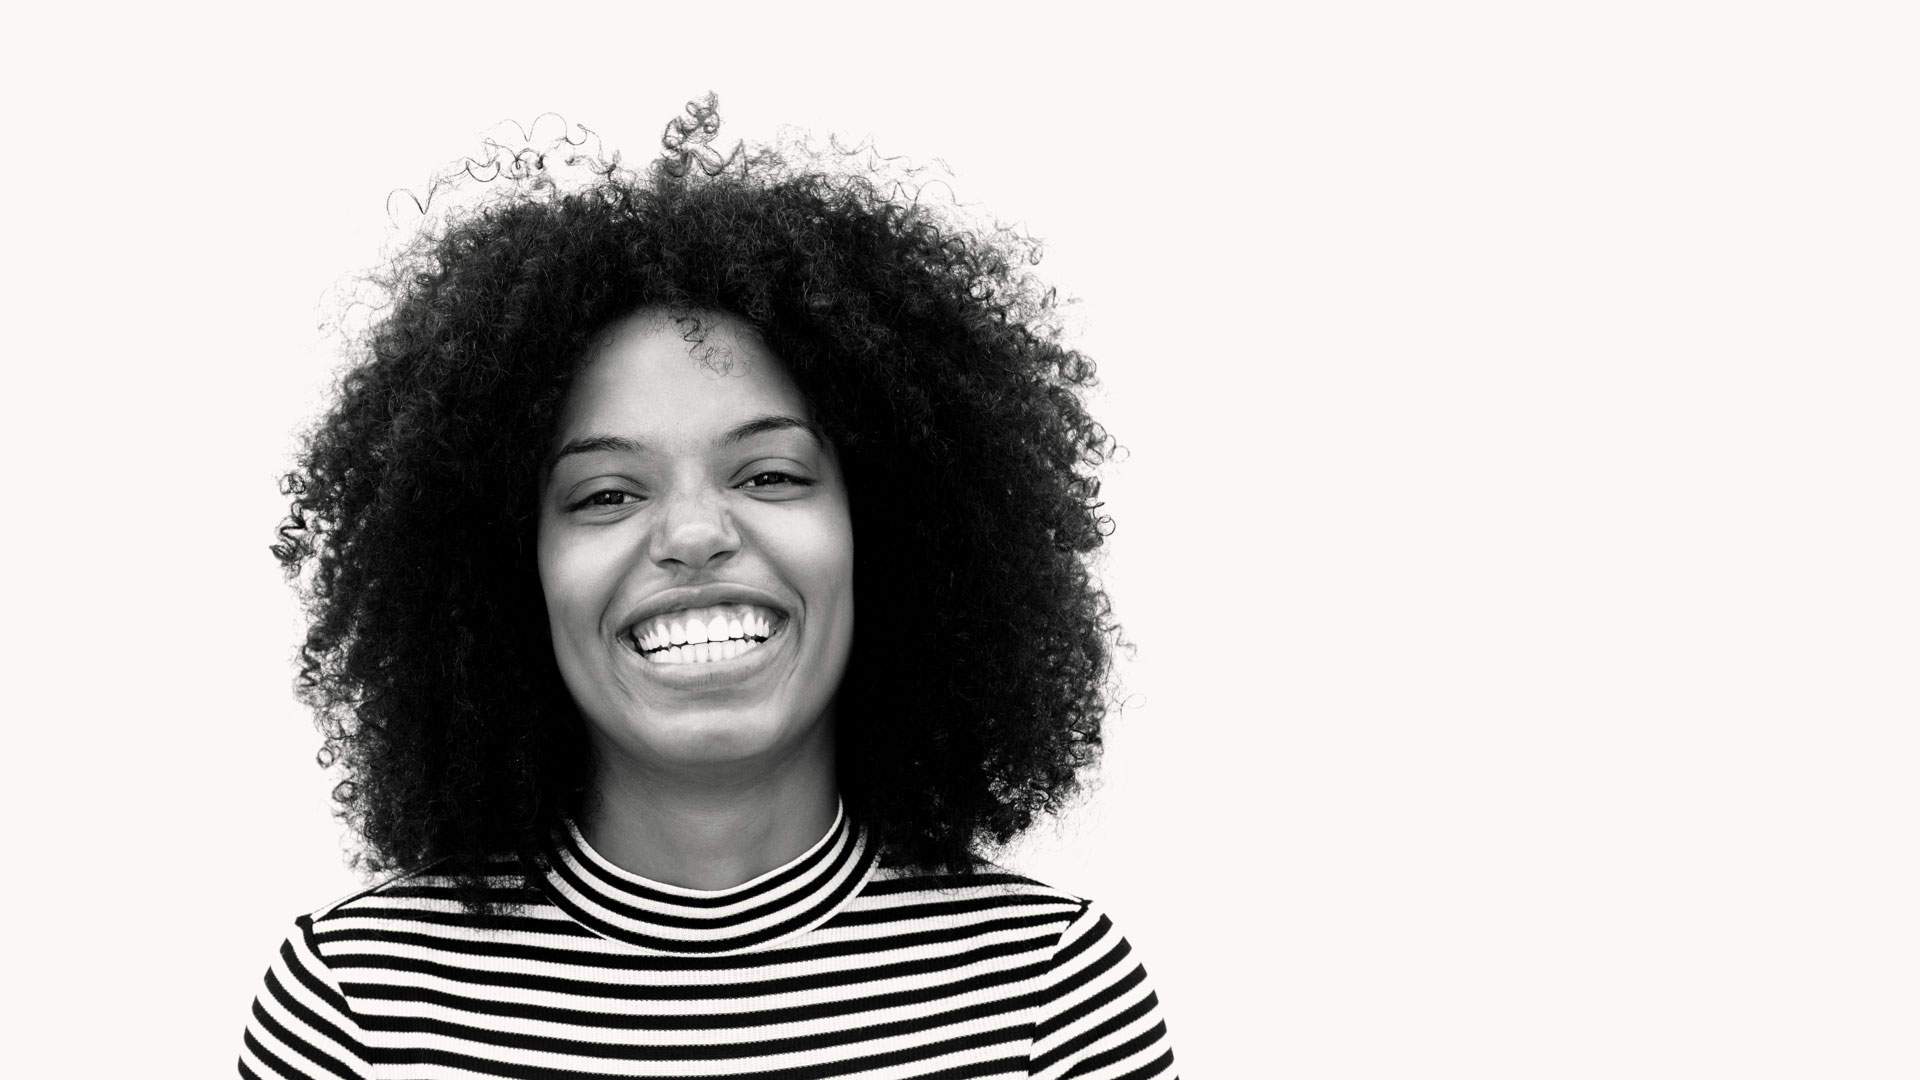 afro-textured hair transplantation